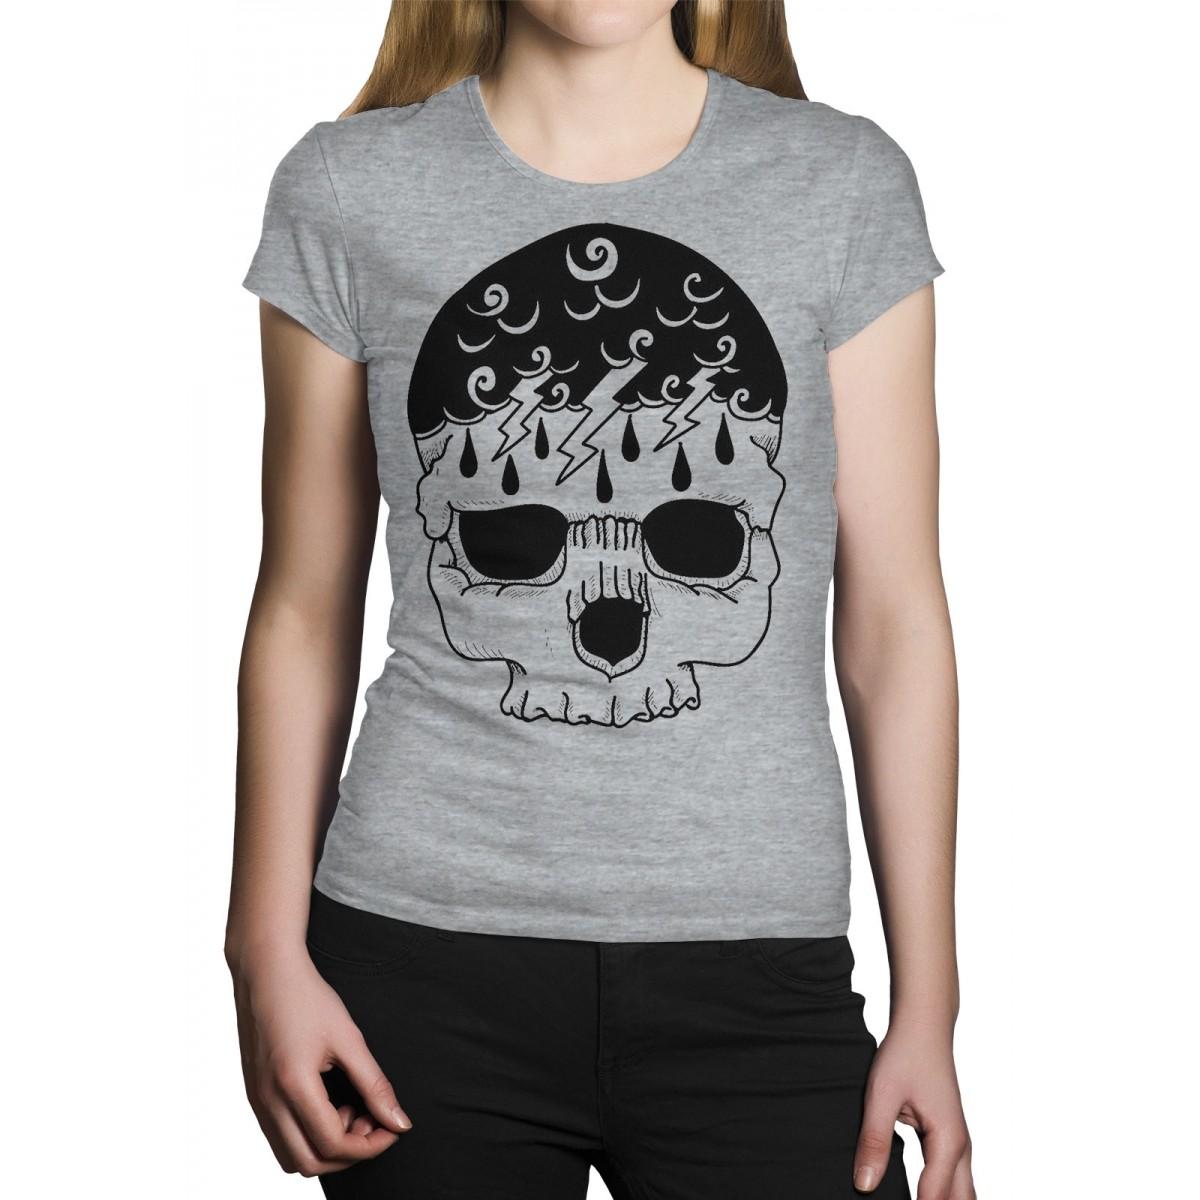 Camiseta HShop Storm Skull Cinza Mescla  - HShop